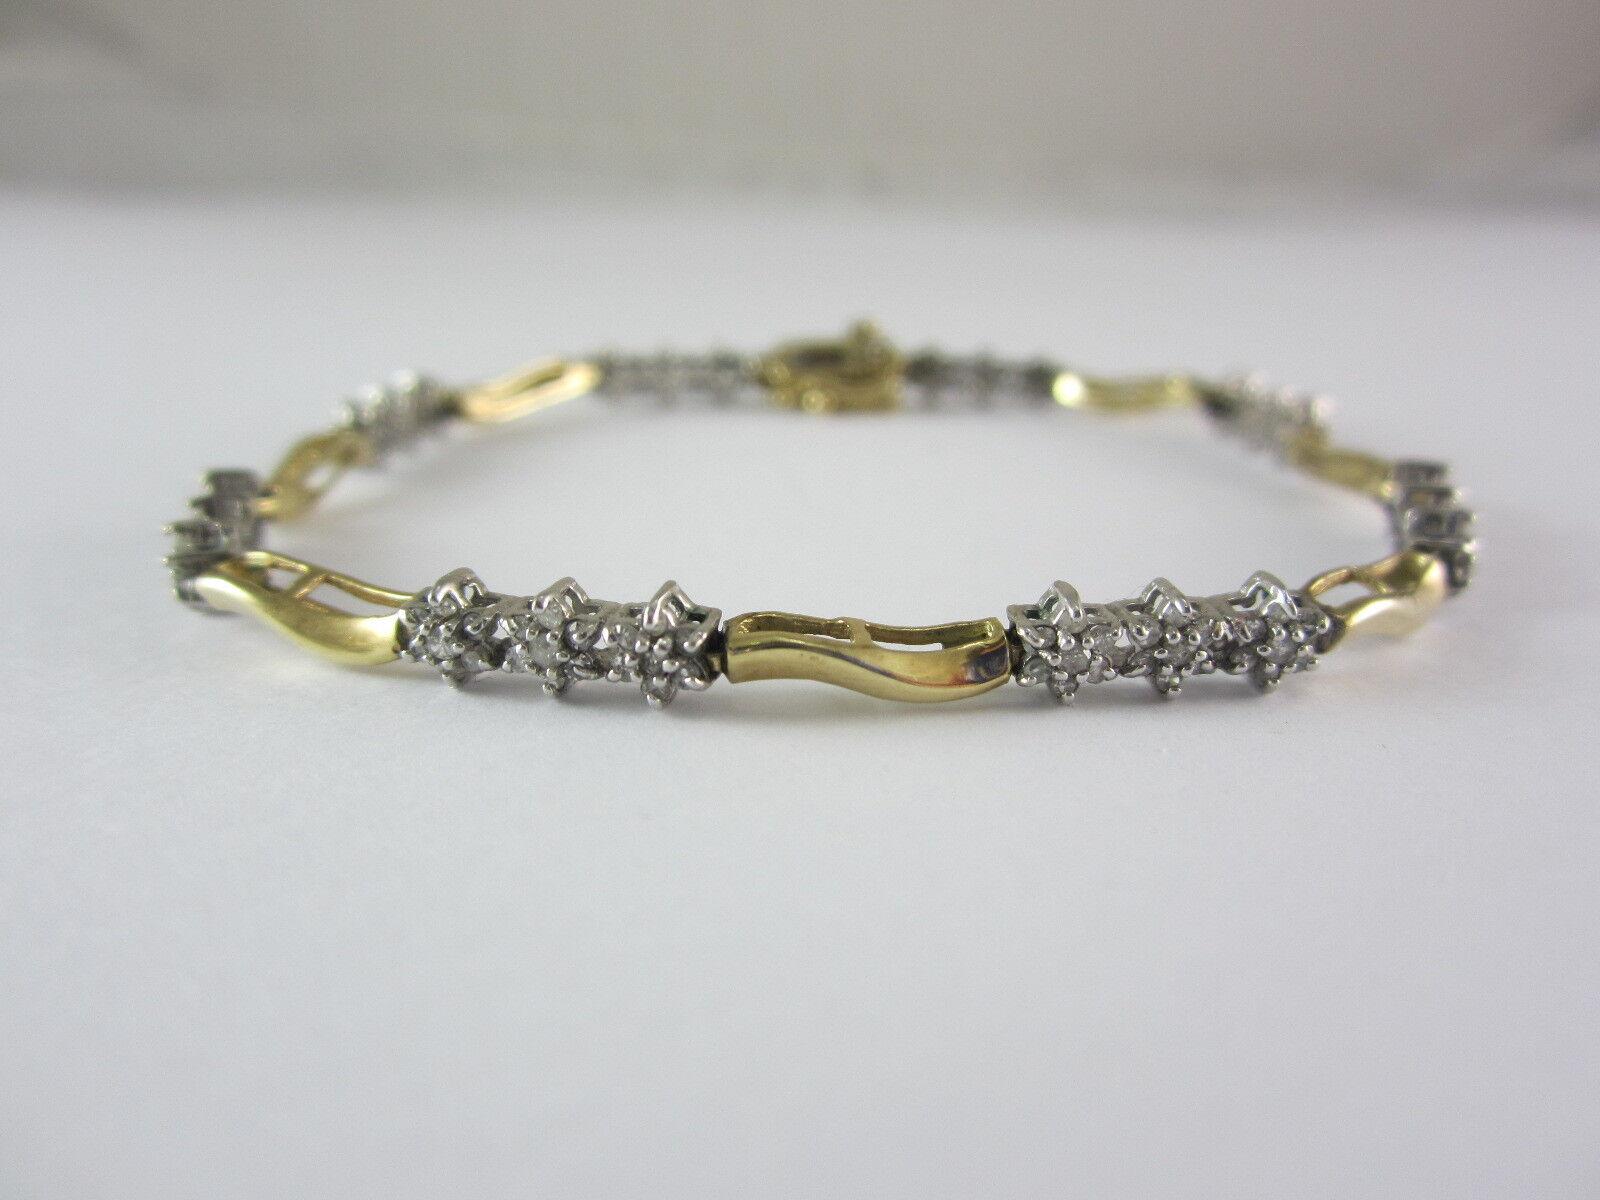 BEAUTIFUL LADIES 10K MULTI-TONE gold DIAMOND  BRACELET 5.9G (.84 TDW)